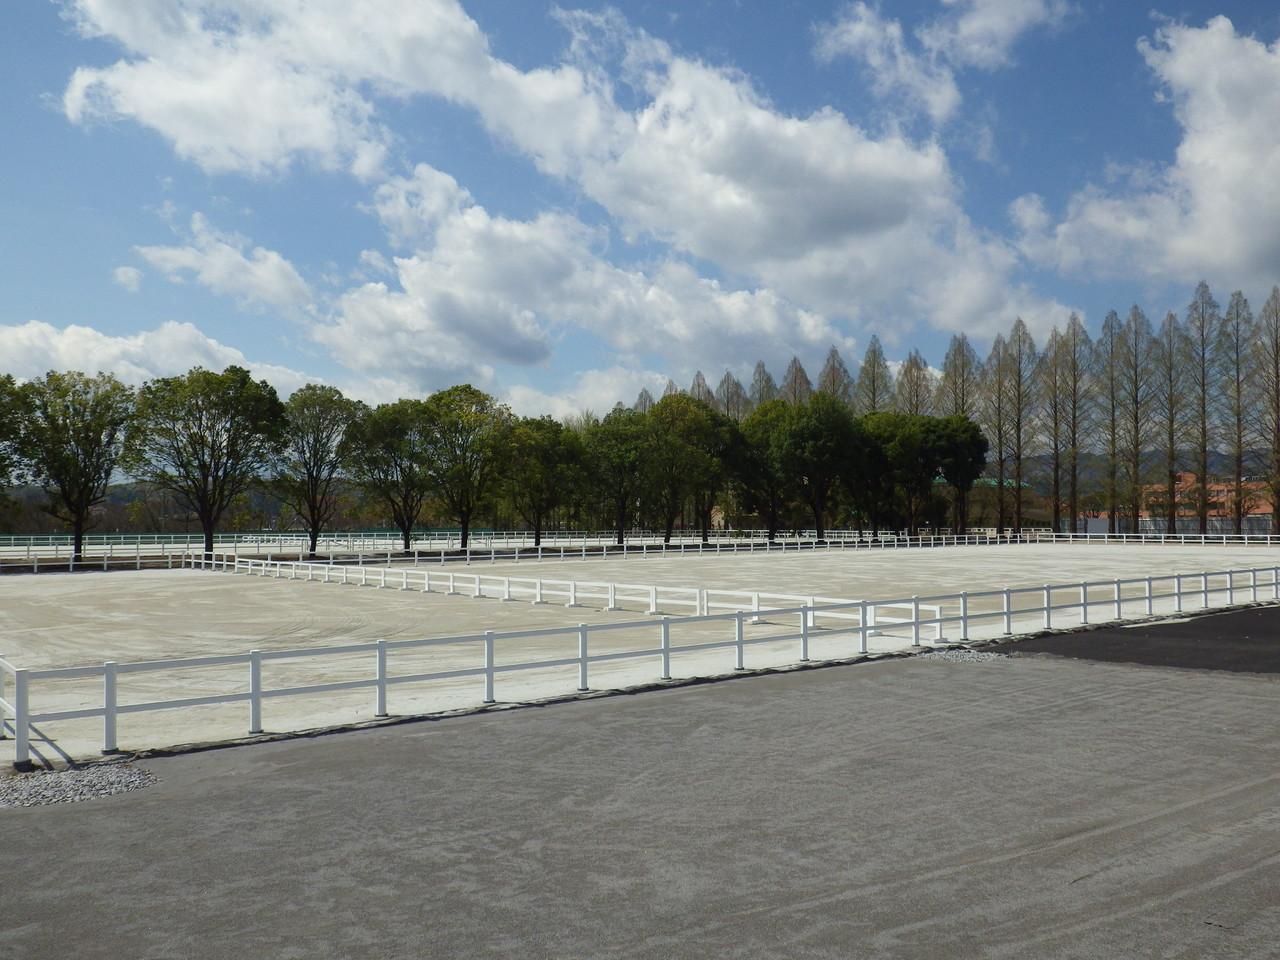 馬場舗装、馬場柵  スポーツ祭東京2013あきる野市特設馬術競技場